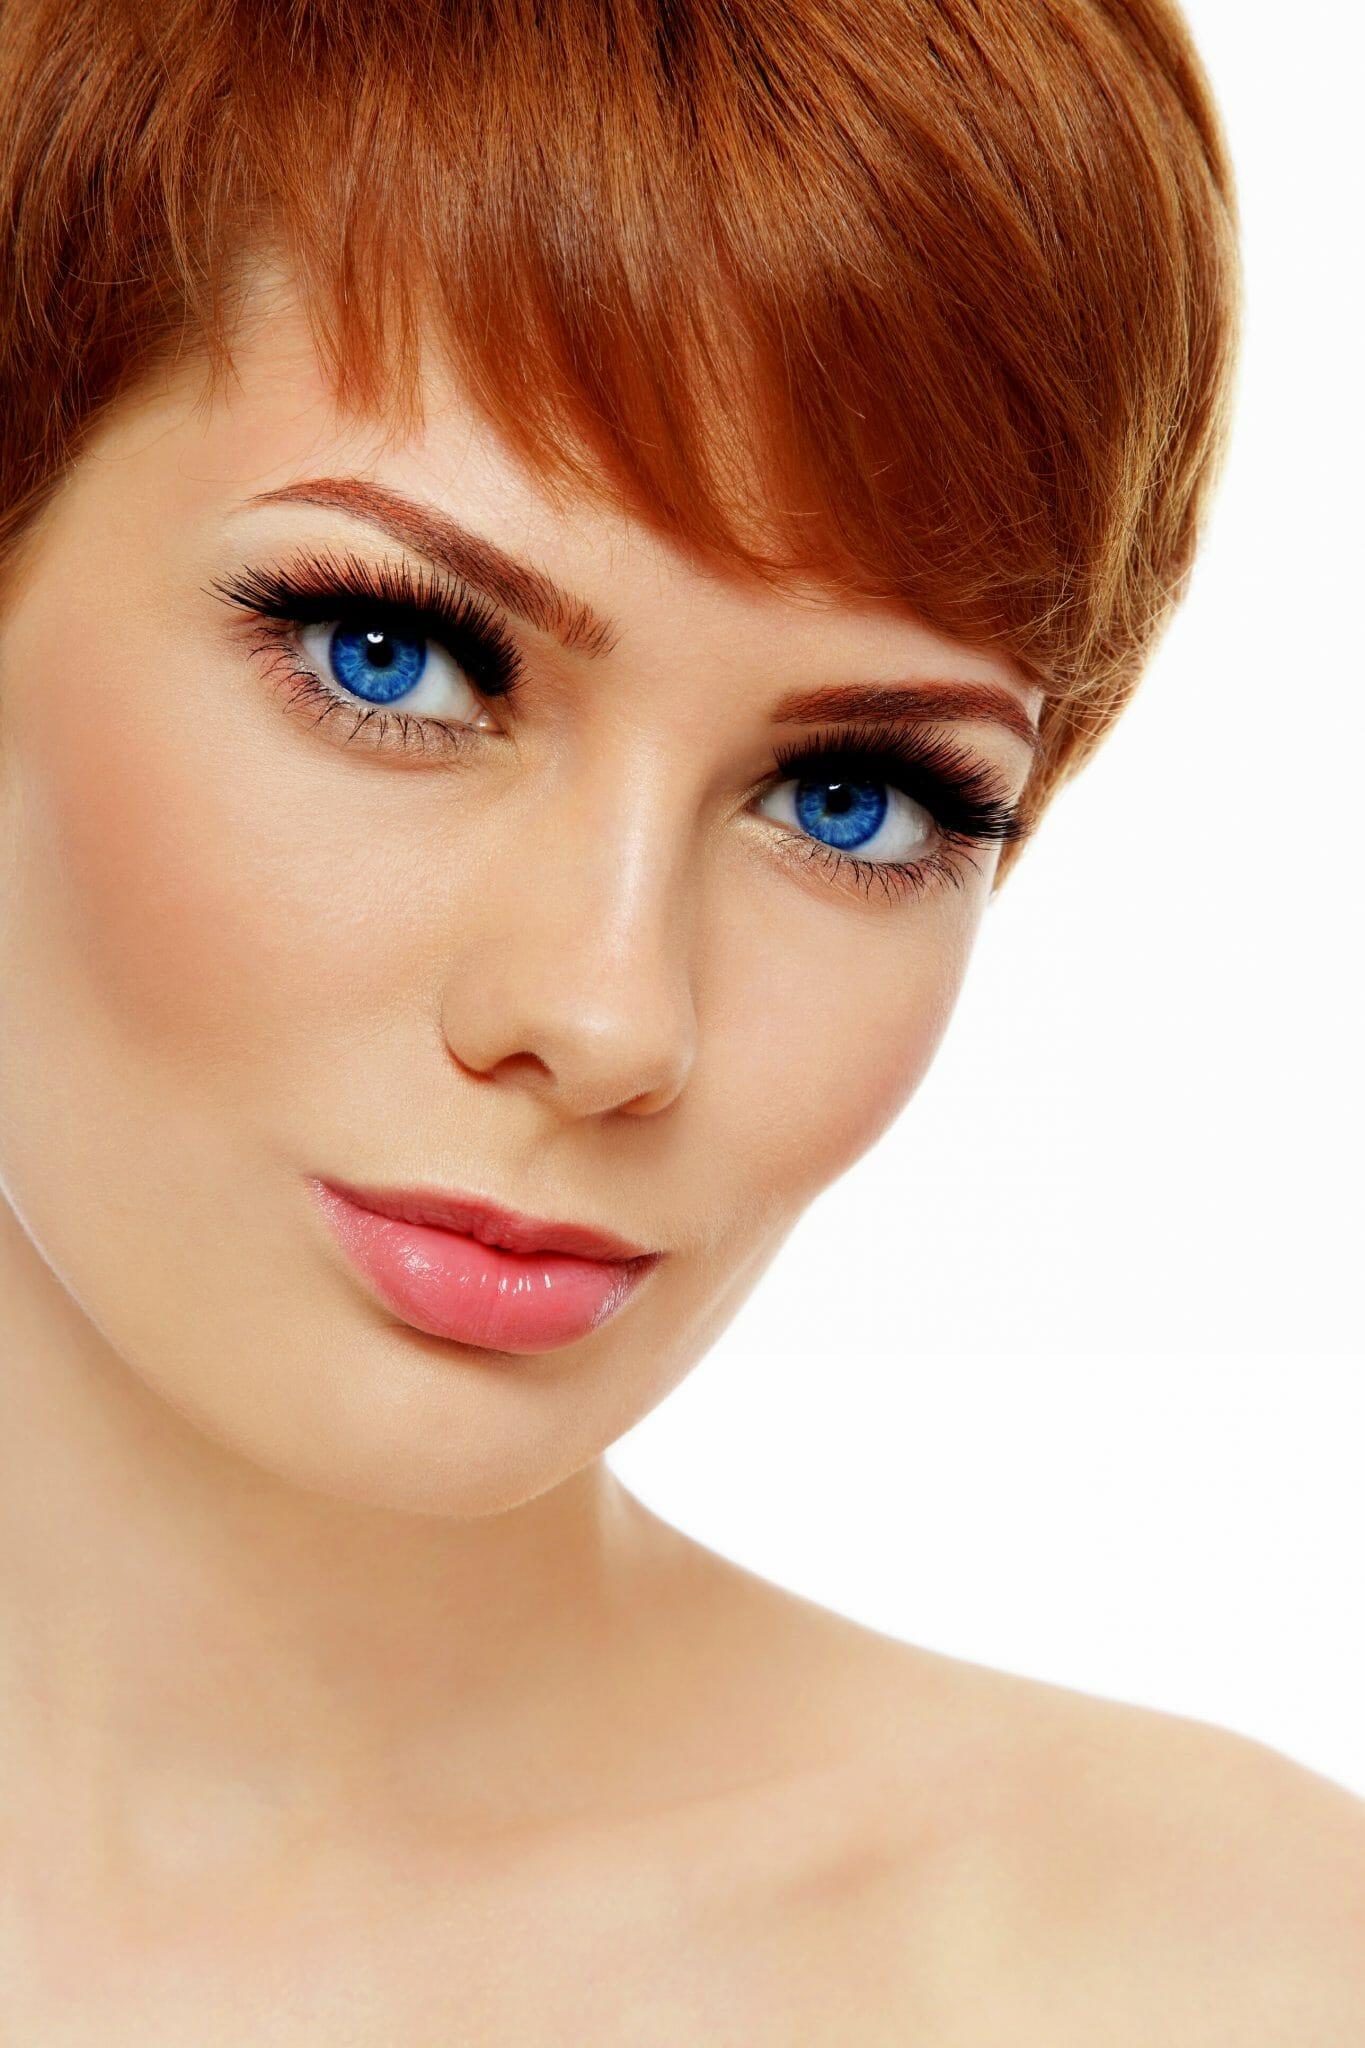 Klassiset ripsipidennykset Kauneushoitola BellaHelena Oulu Finland Red Head Woman with Stunning Eyelash extensions